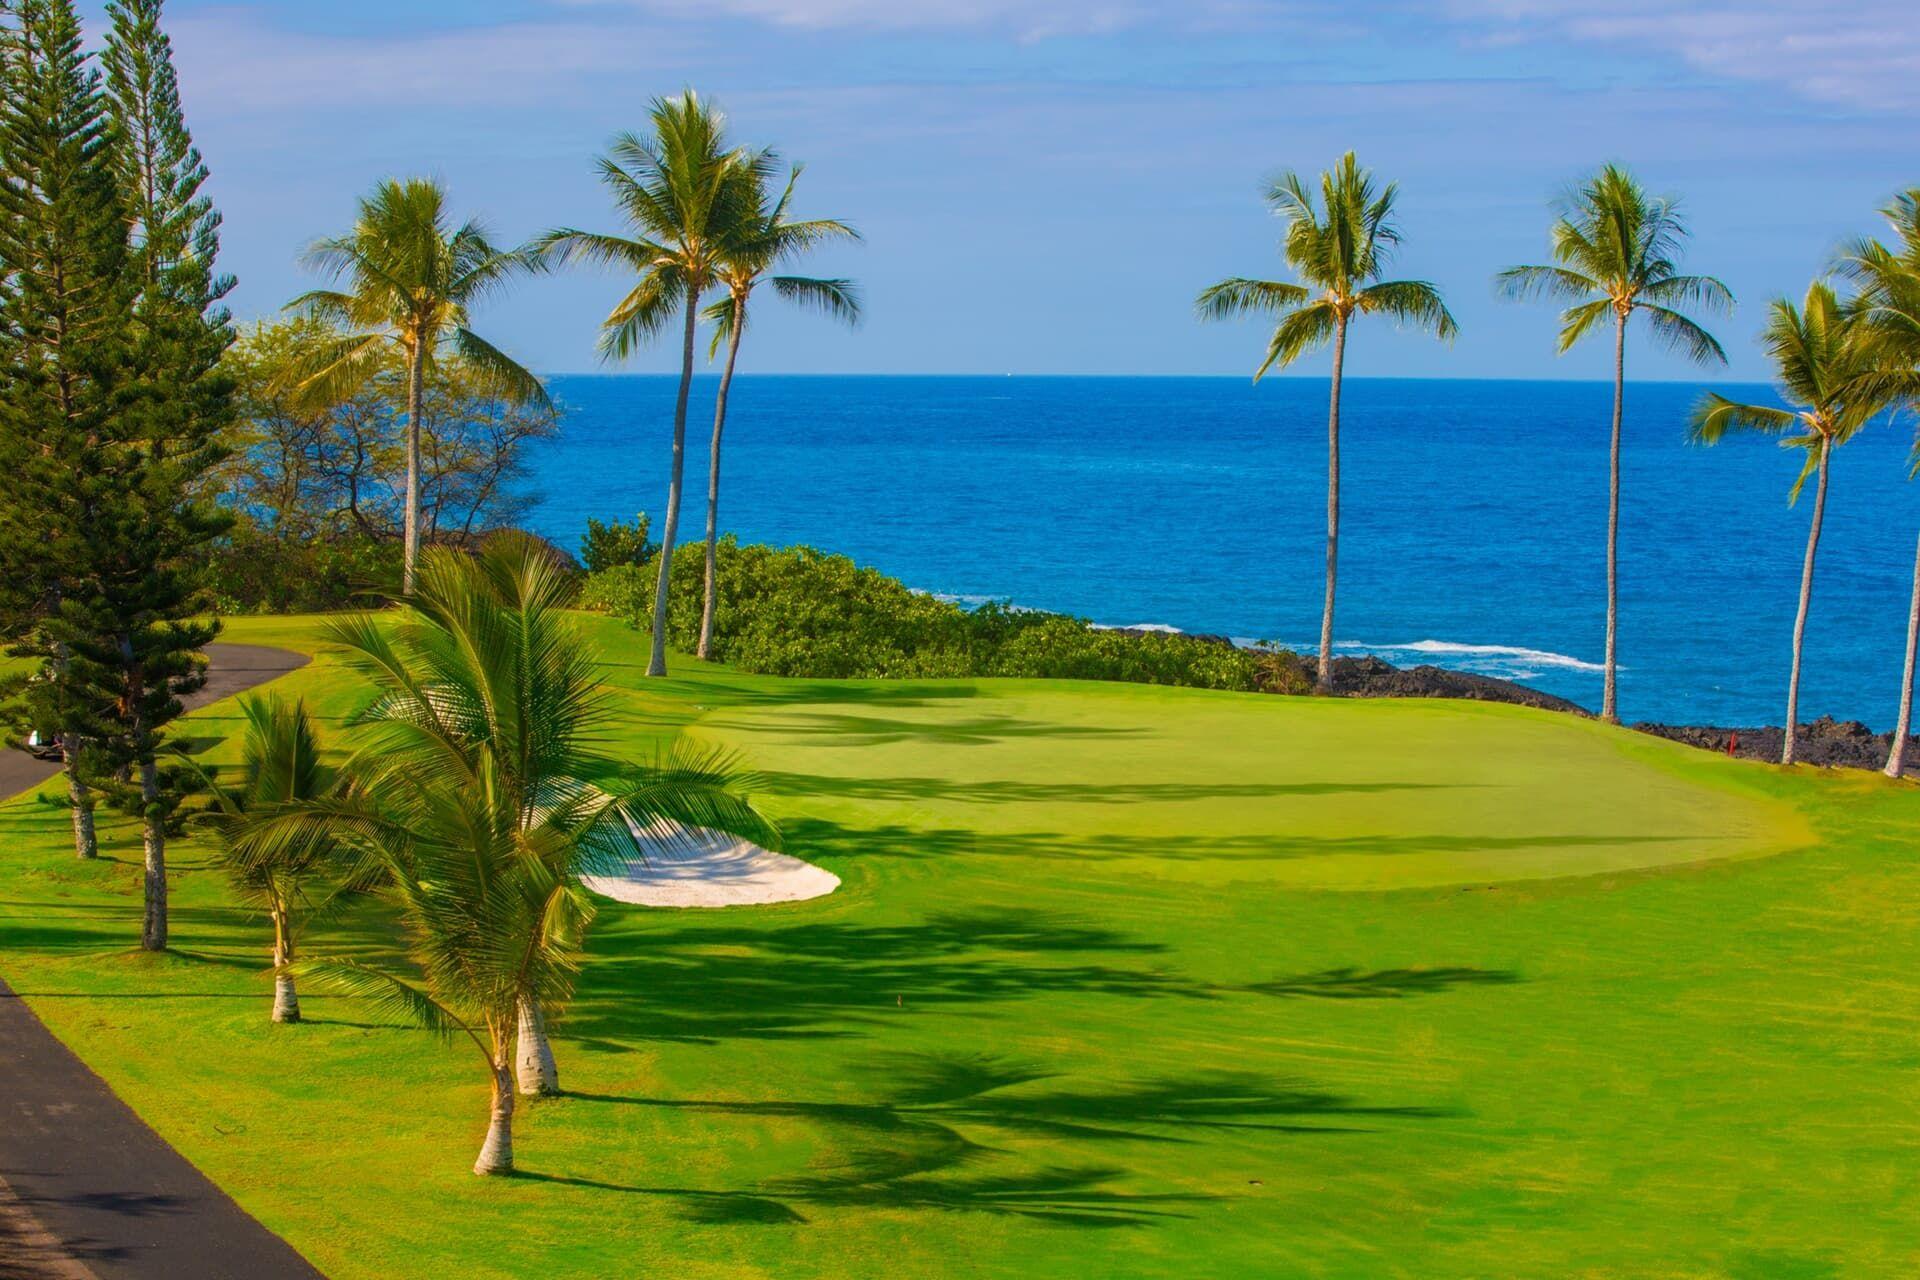 单亲家庭 为 销售 在 Makai Plan 4 Home 26 78-7065 Holuaki Loop Kailua-Kona, Hawaii 96740 United States